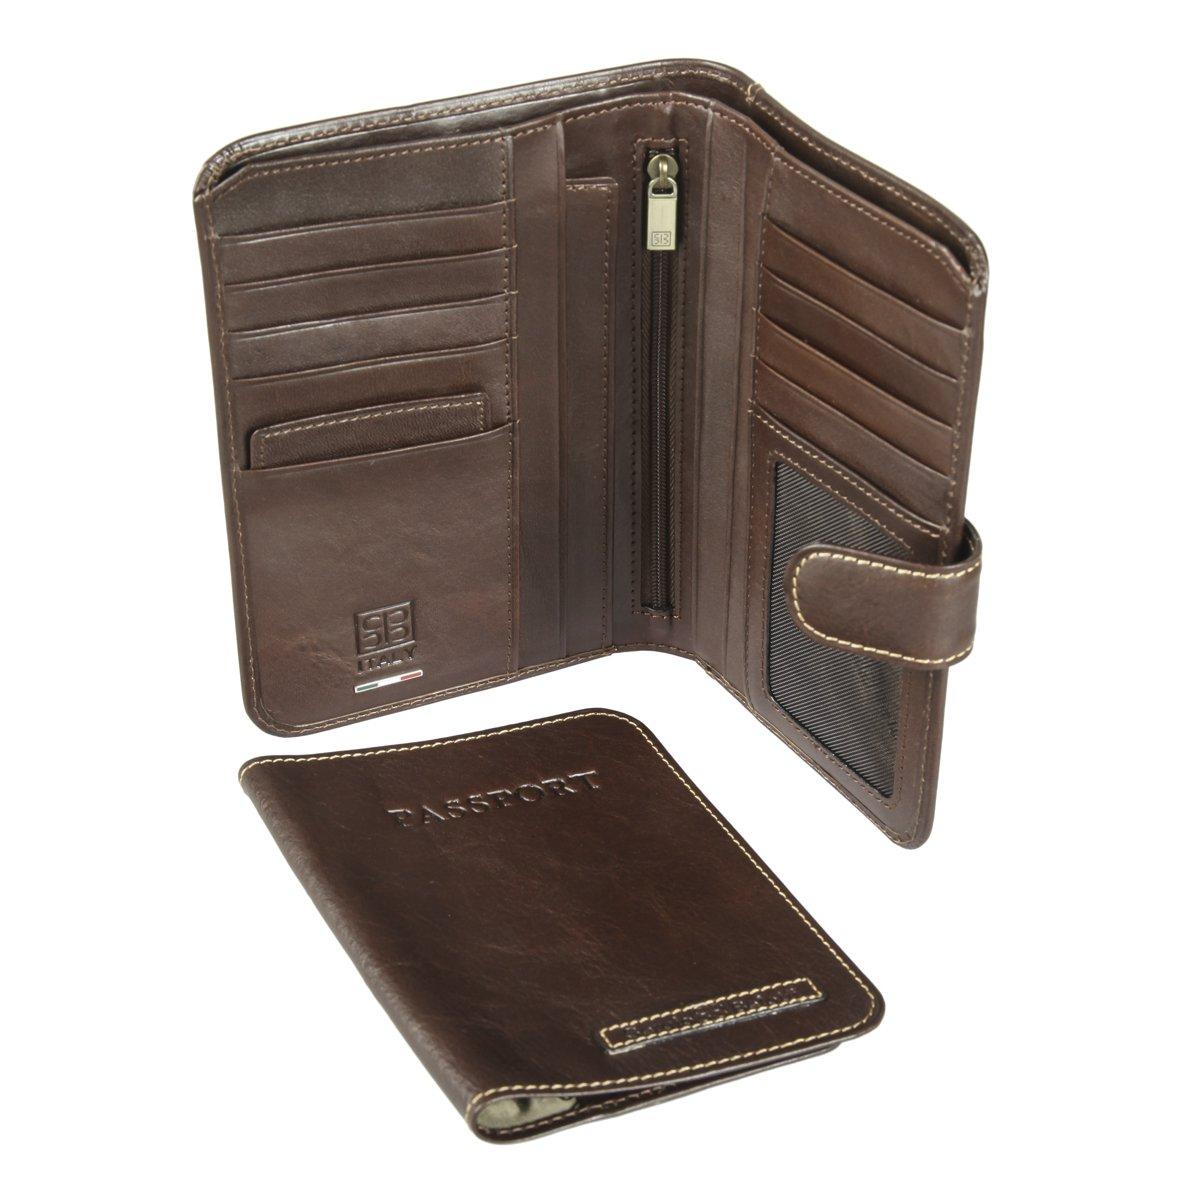 15d7f0dd7299 2334 ancona brown Портмоне с обложкой для паспорта Sergio Belotti — доп.  фото №3